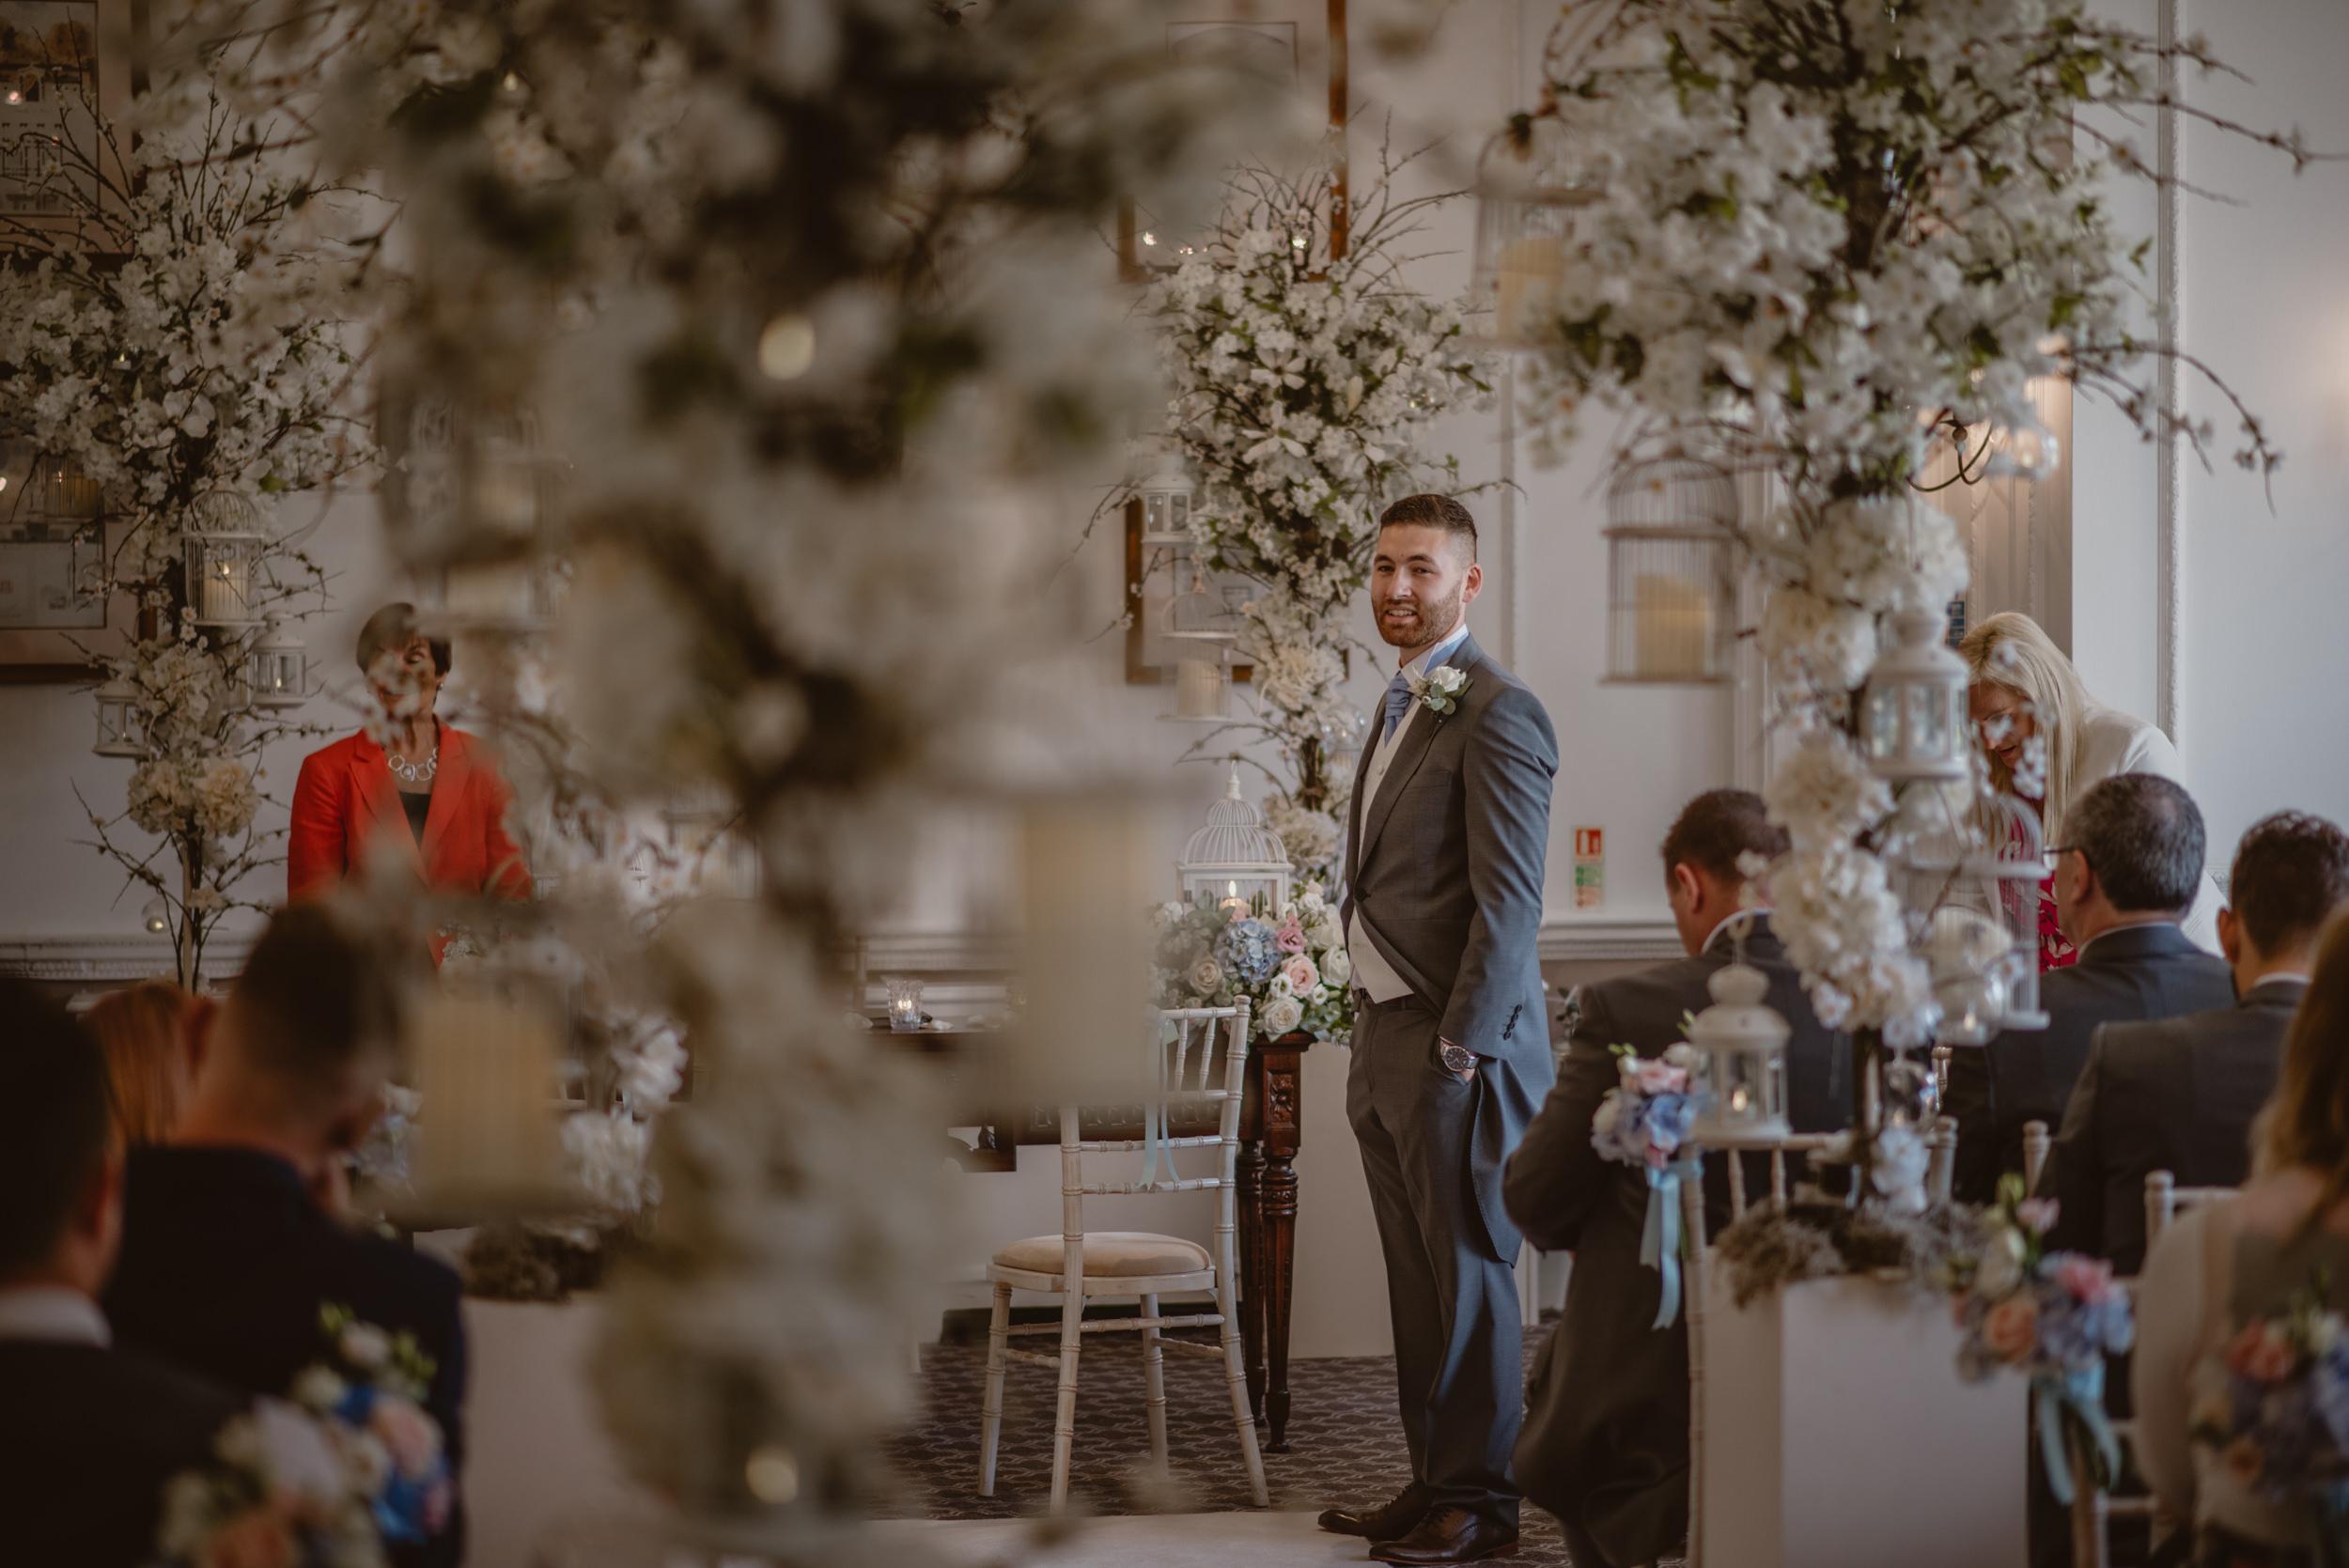 Rachel-and-James-Wedding-Horsley-Towers-State-Manu-Mendoza-Wedding-Photography-207.jpg